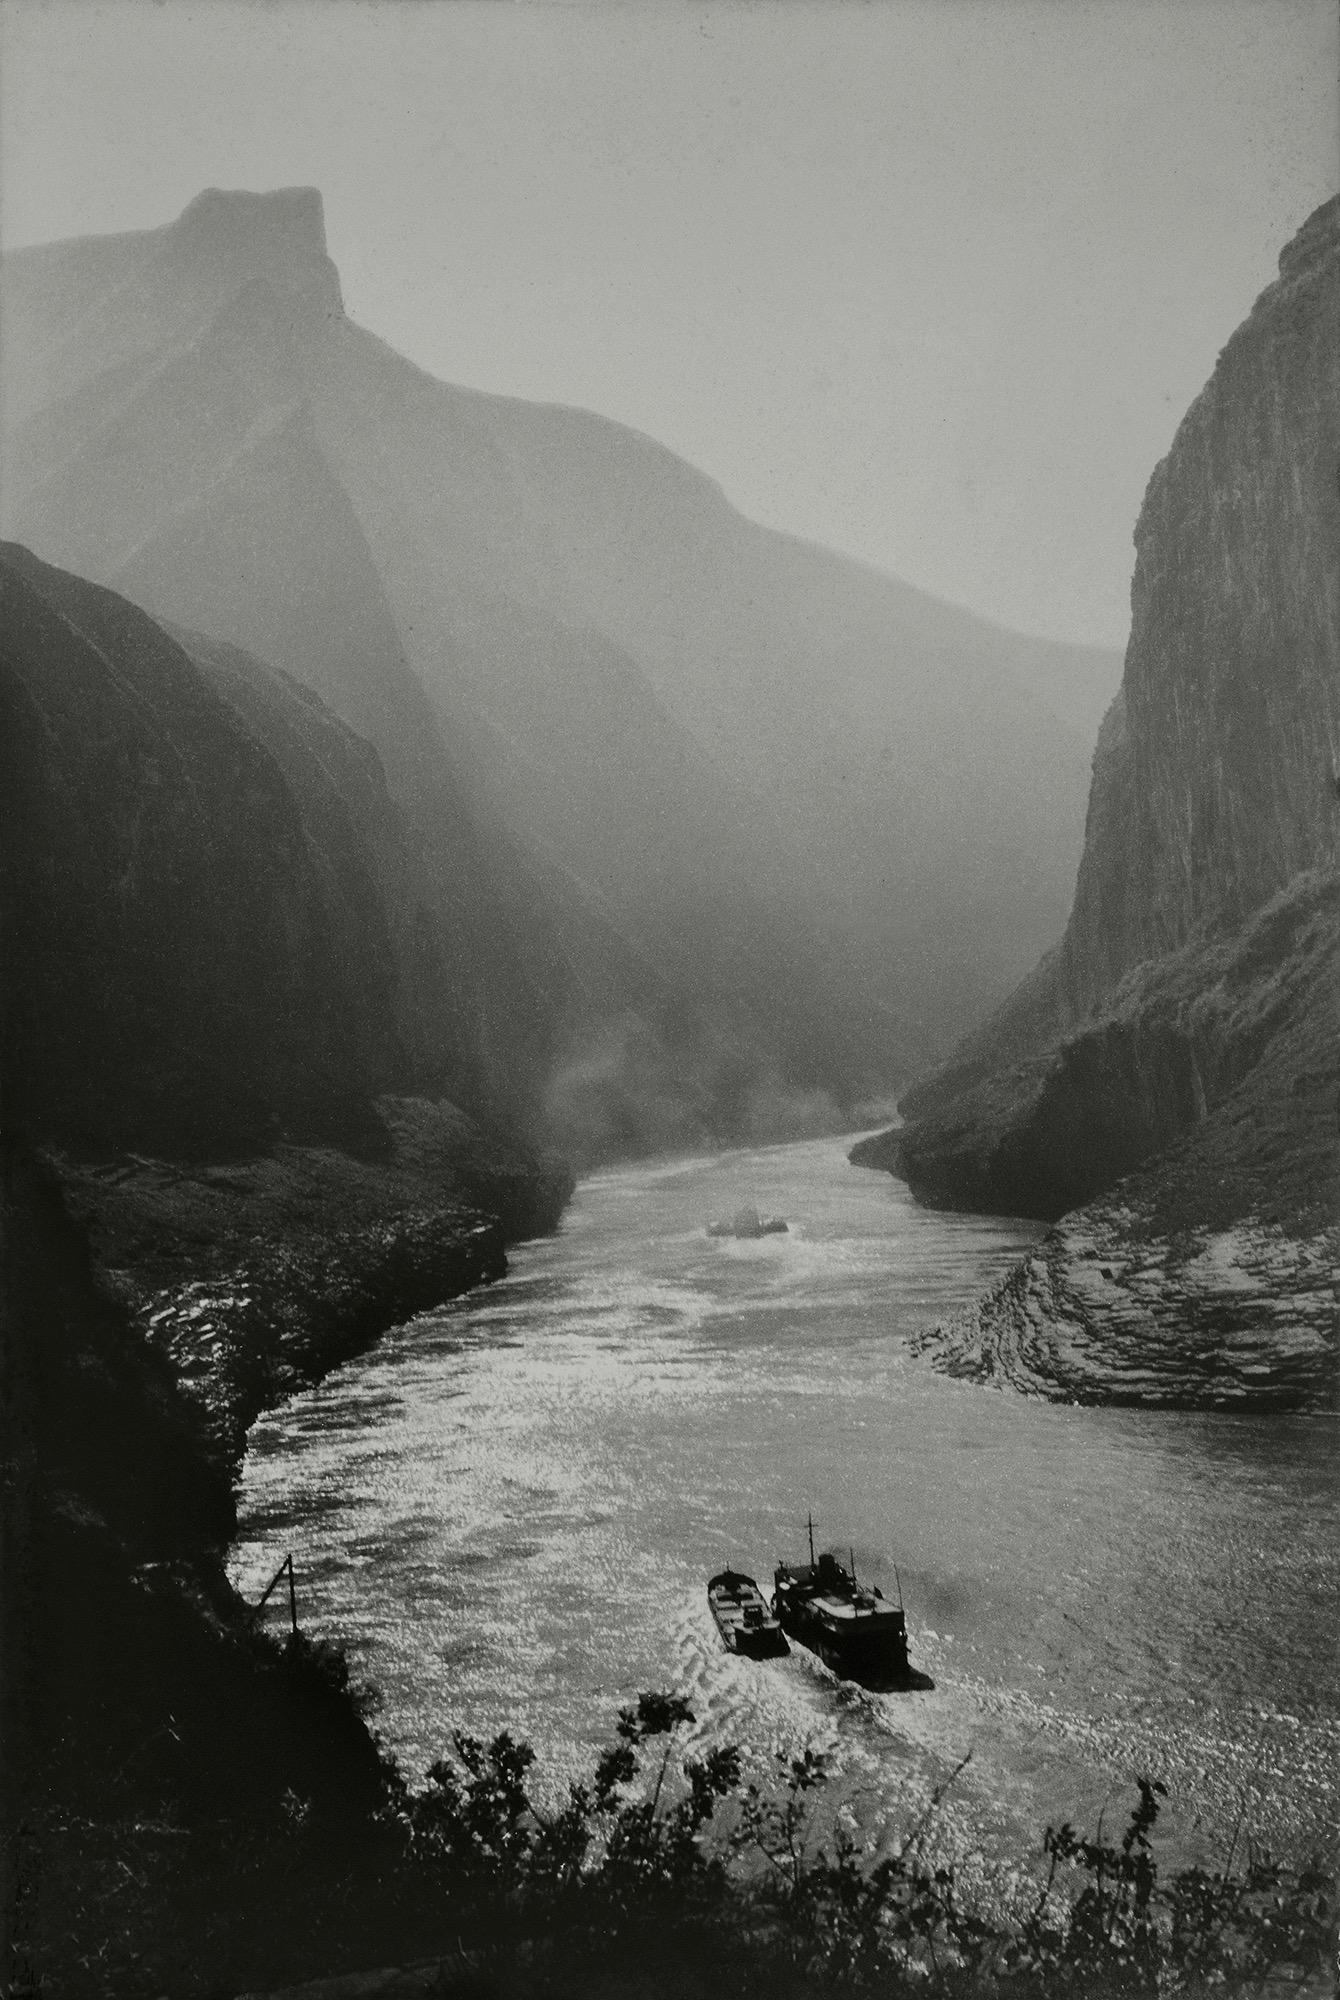 Xue Zijiang, Three Hundred Miles to Jiangling by Night-fall